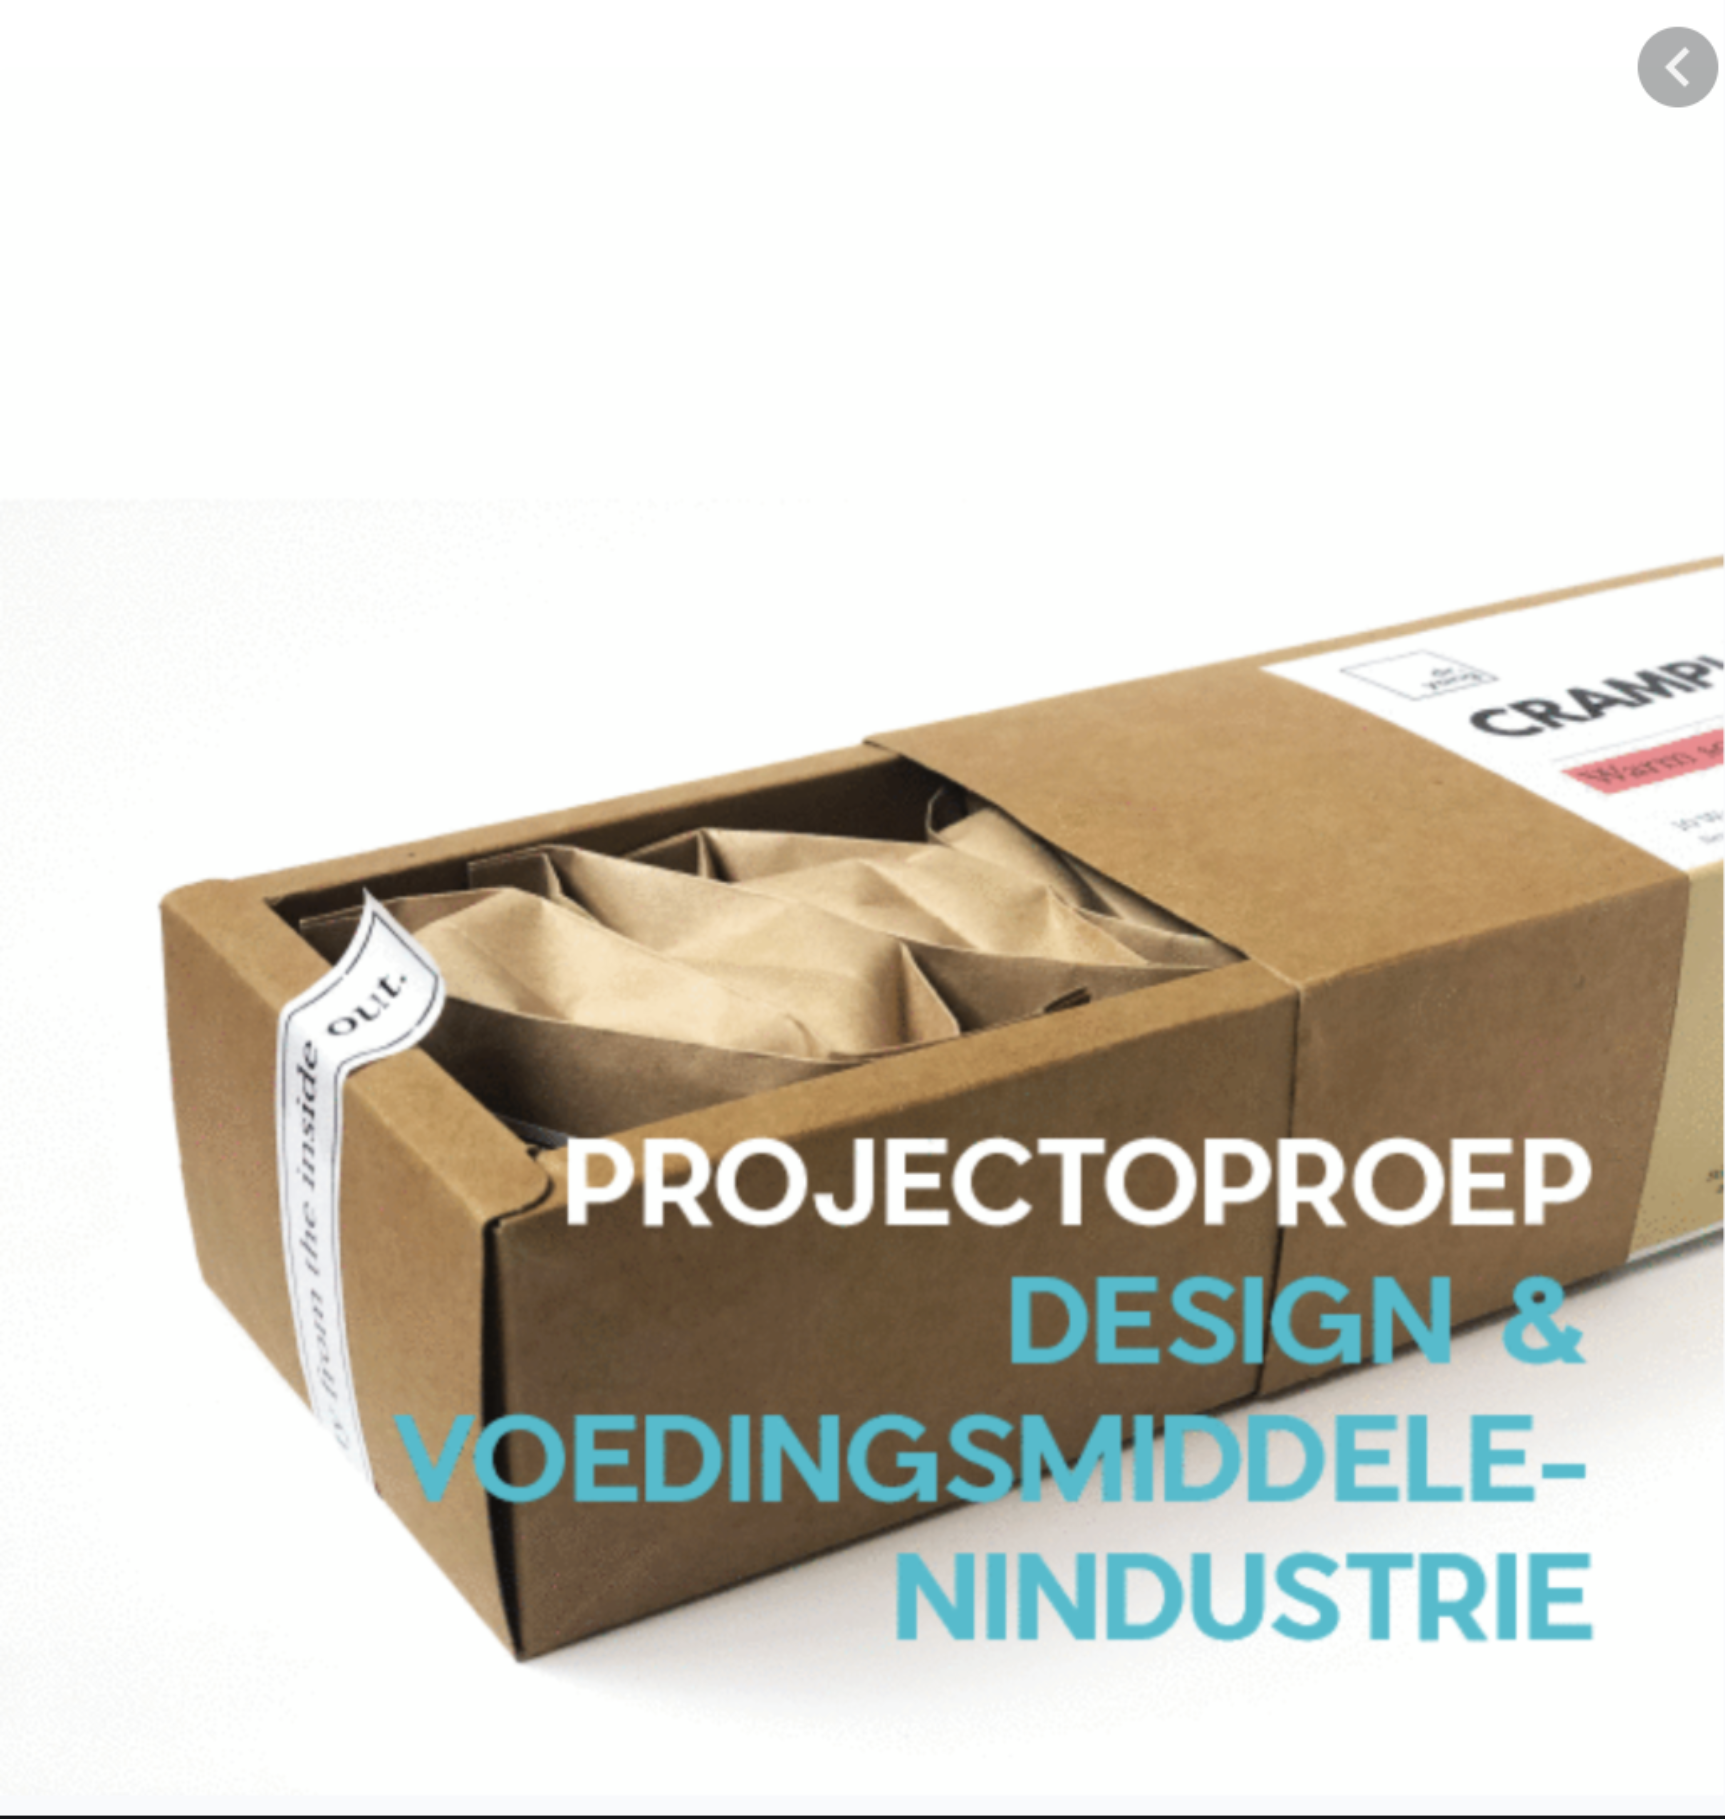 Projectoproep design voedingsmiddelenindustrie